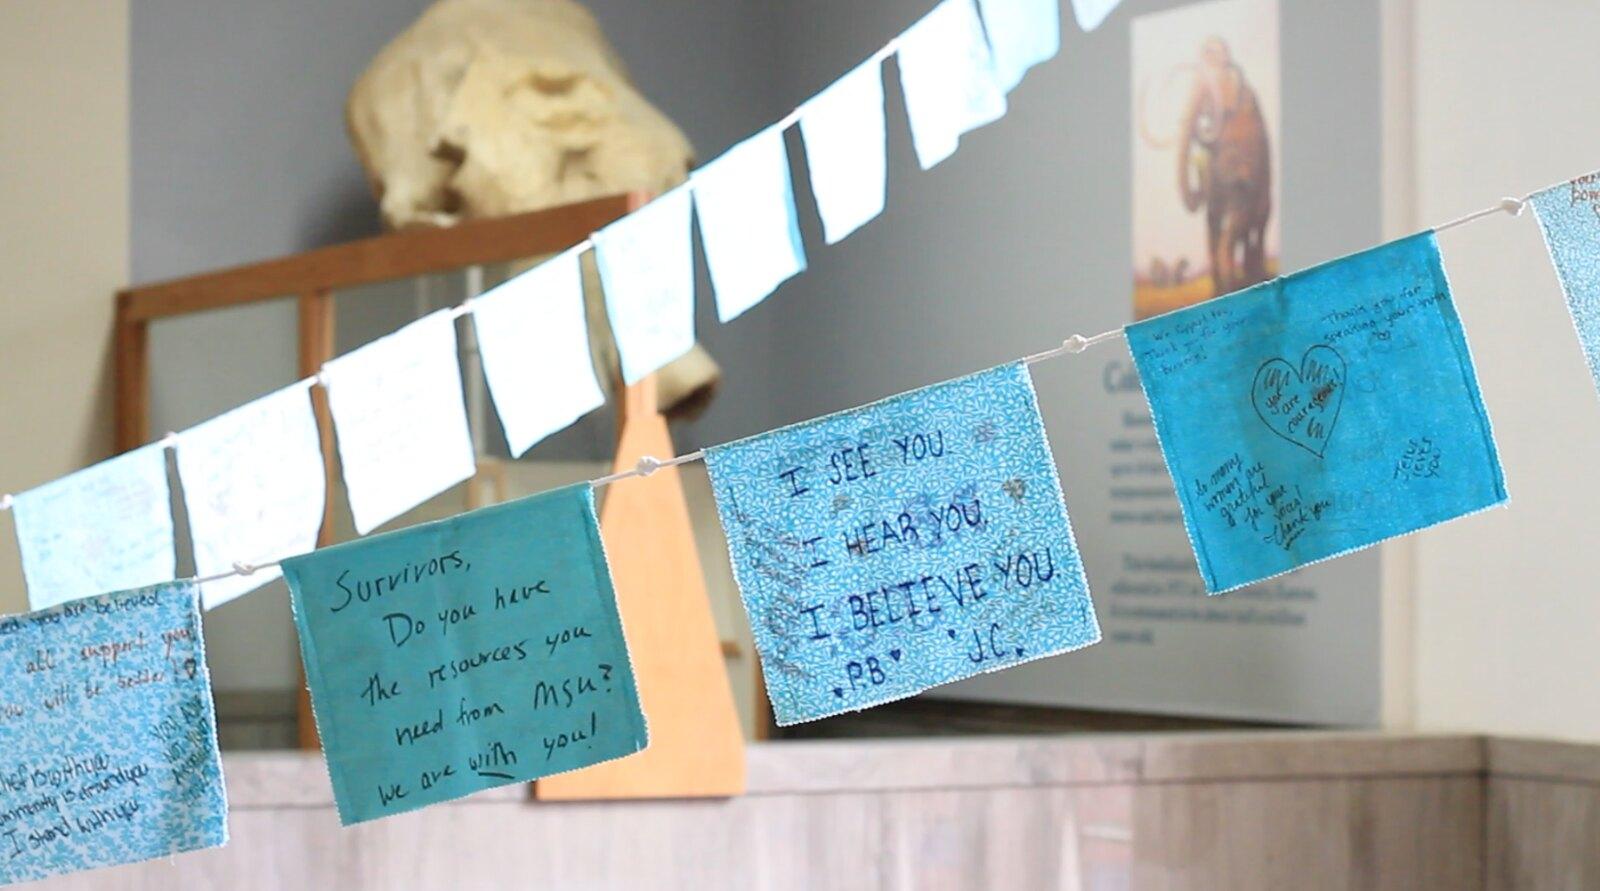 MSU Museum Heals Through Art for Sister Survivors